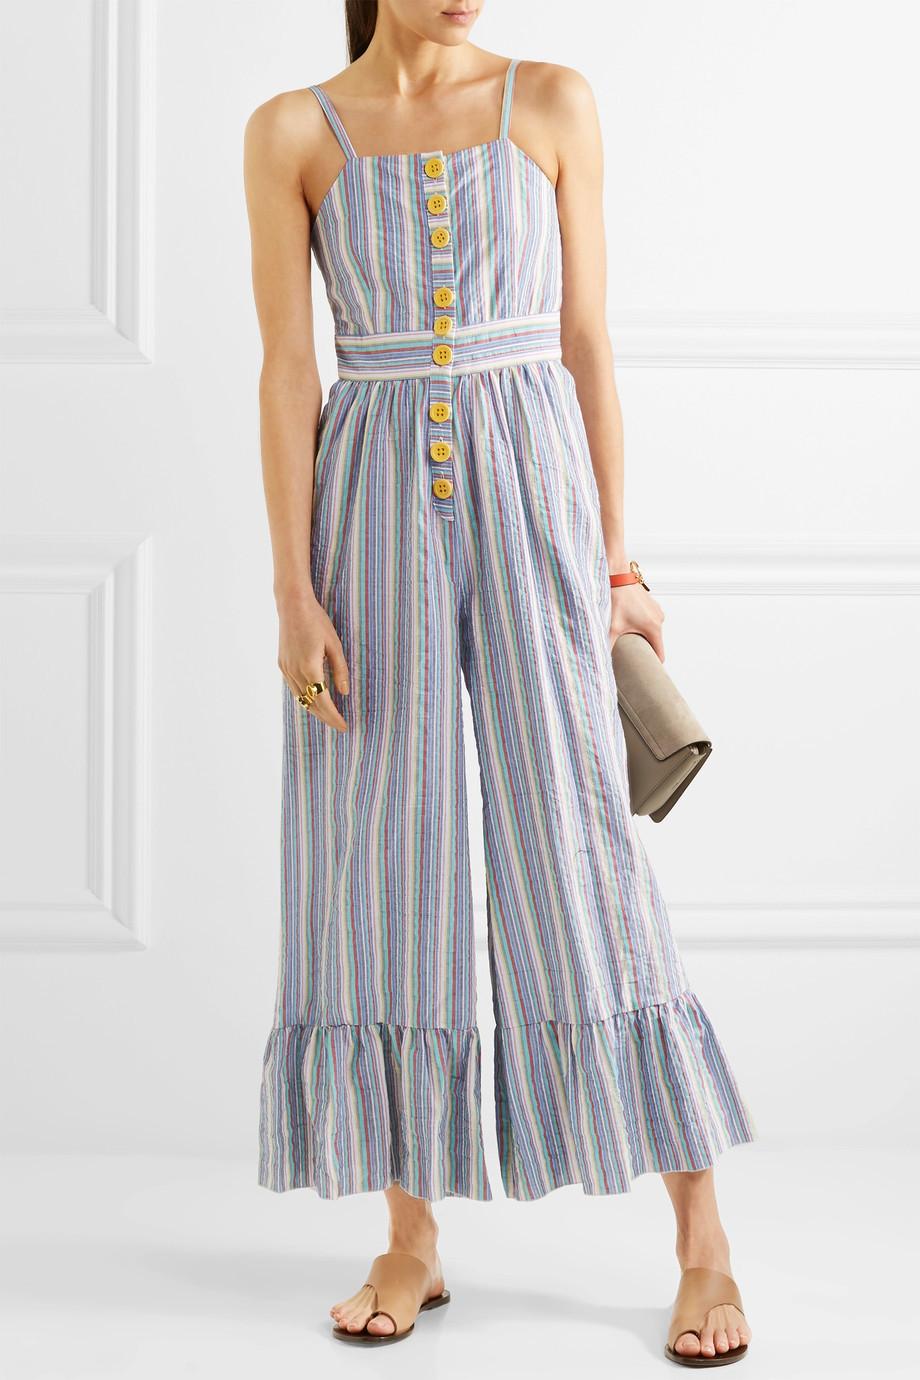 See by Chloe Striped cotton-seersucker jumpsuit $395